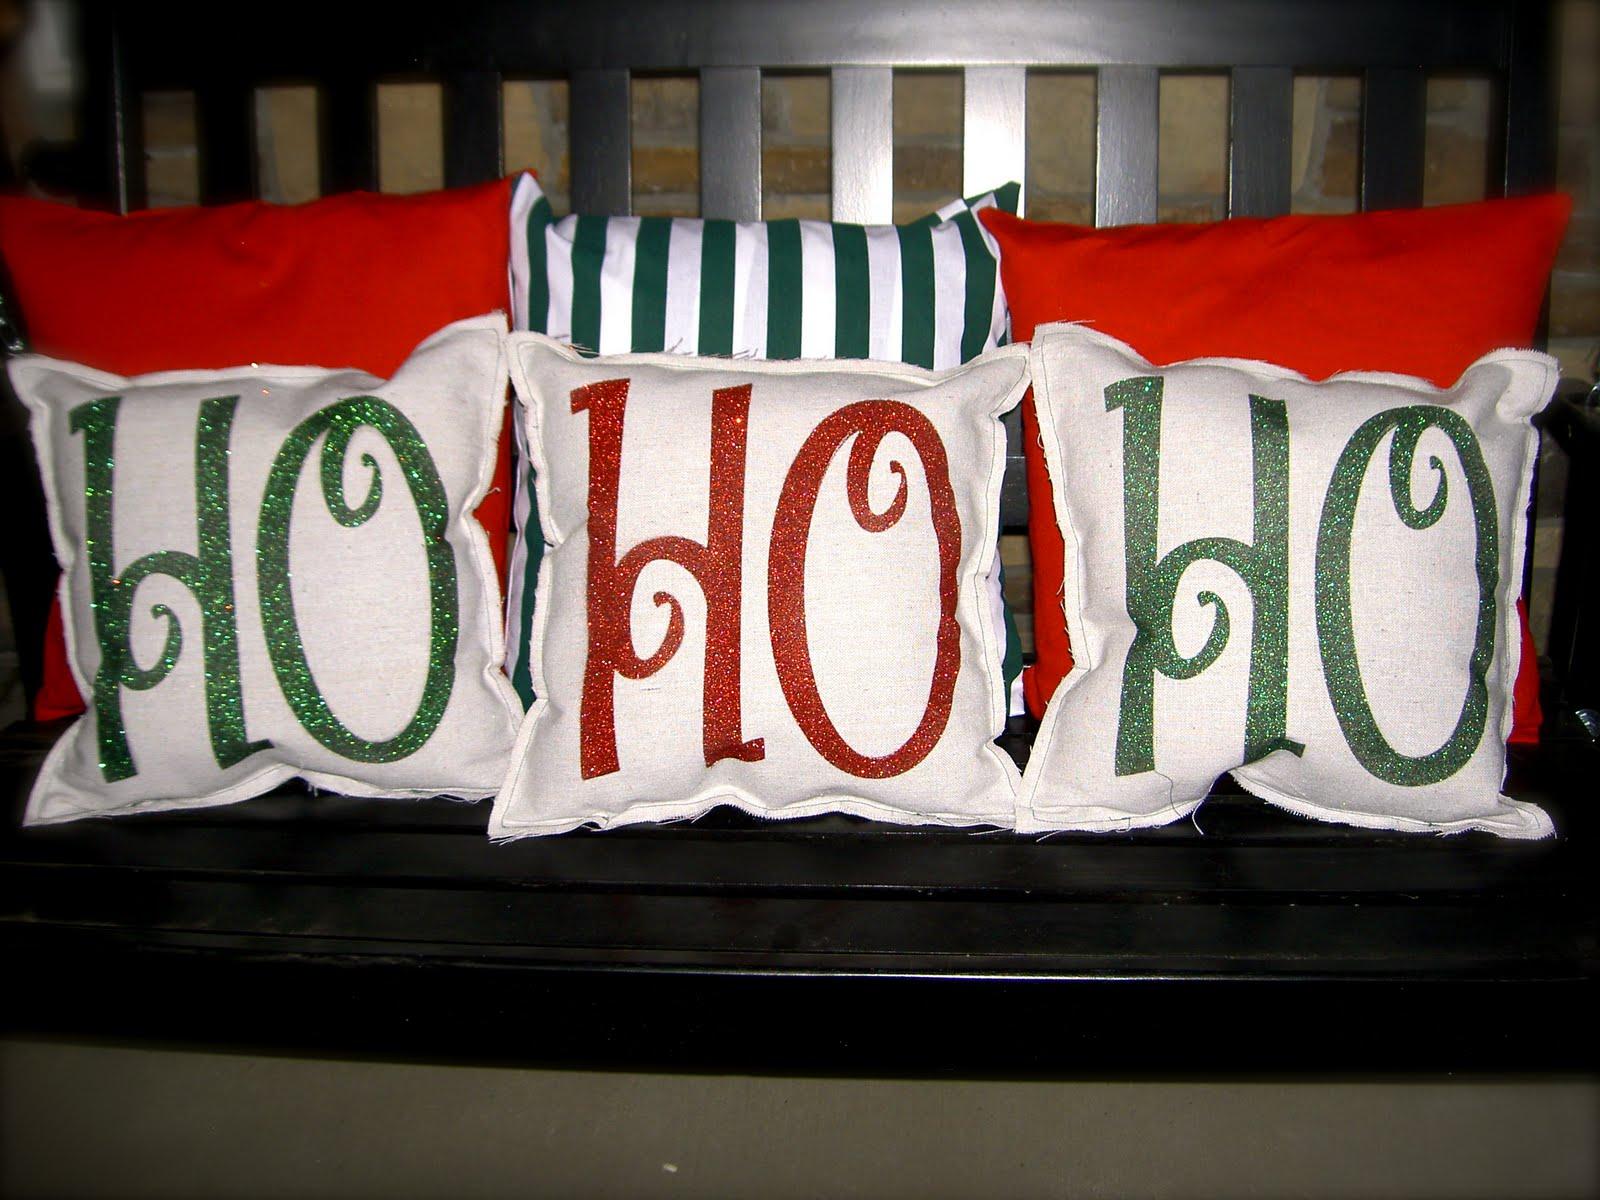 Ho ho holiday printouts to color - Ho Ho Holiday Printouts To Color 48